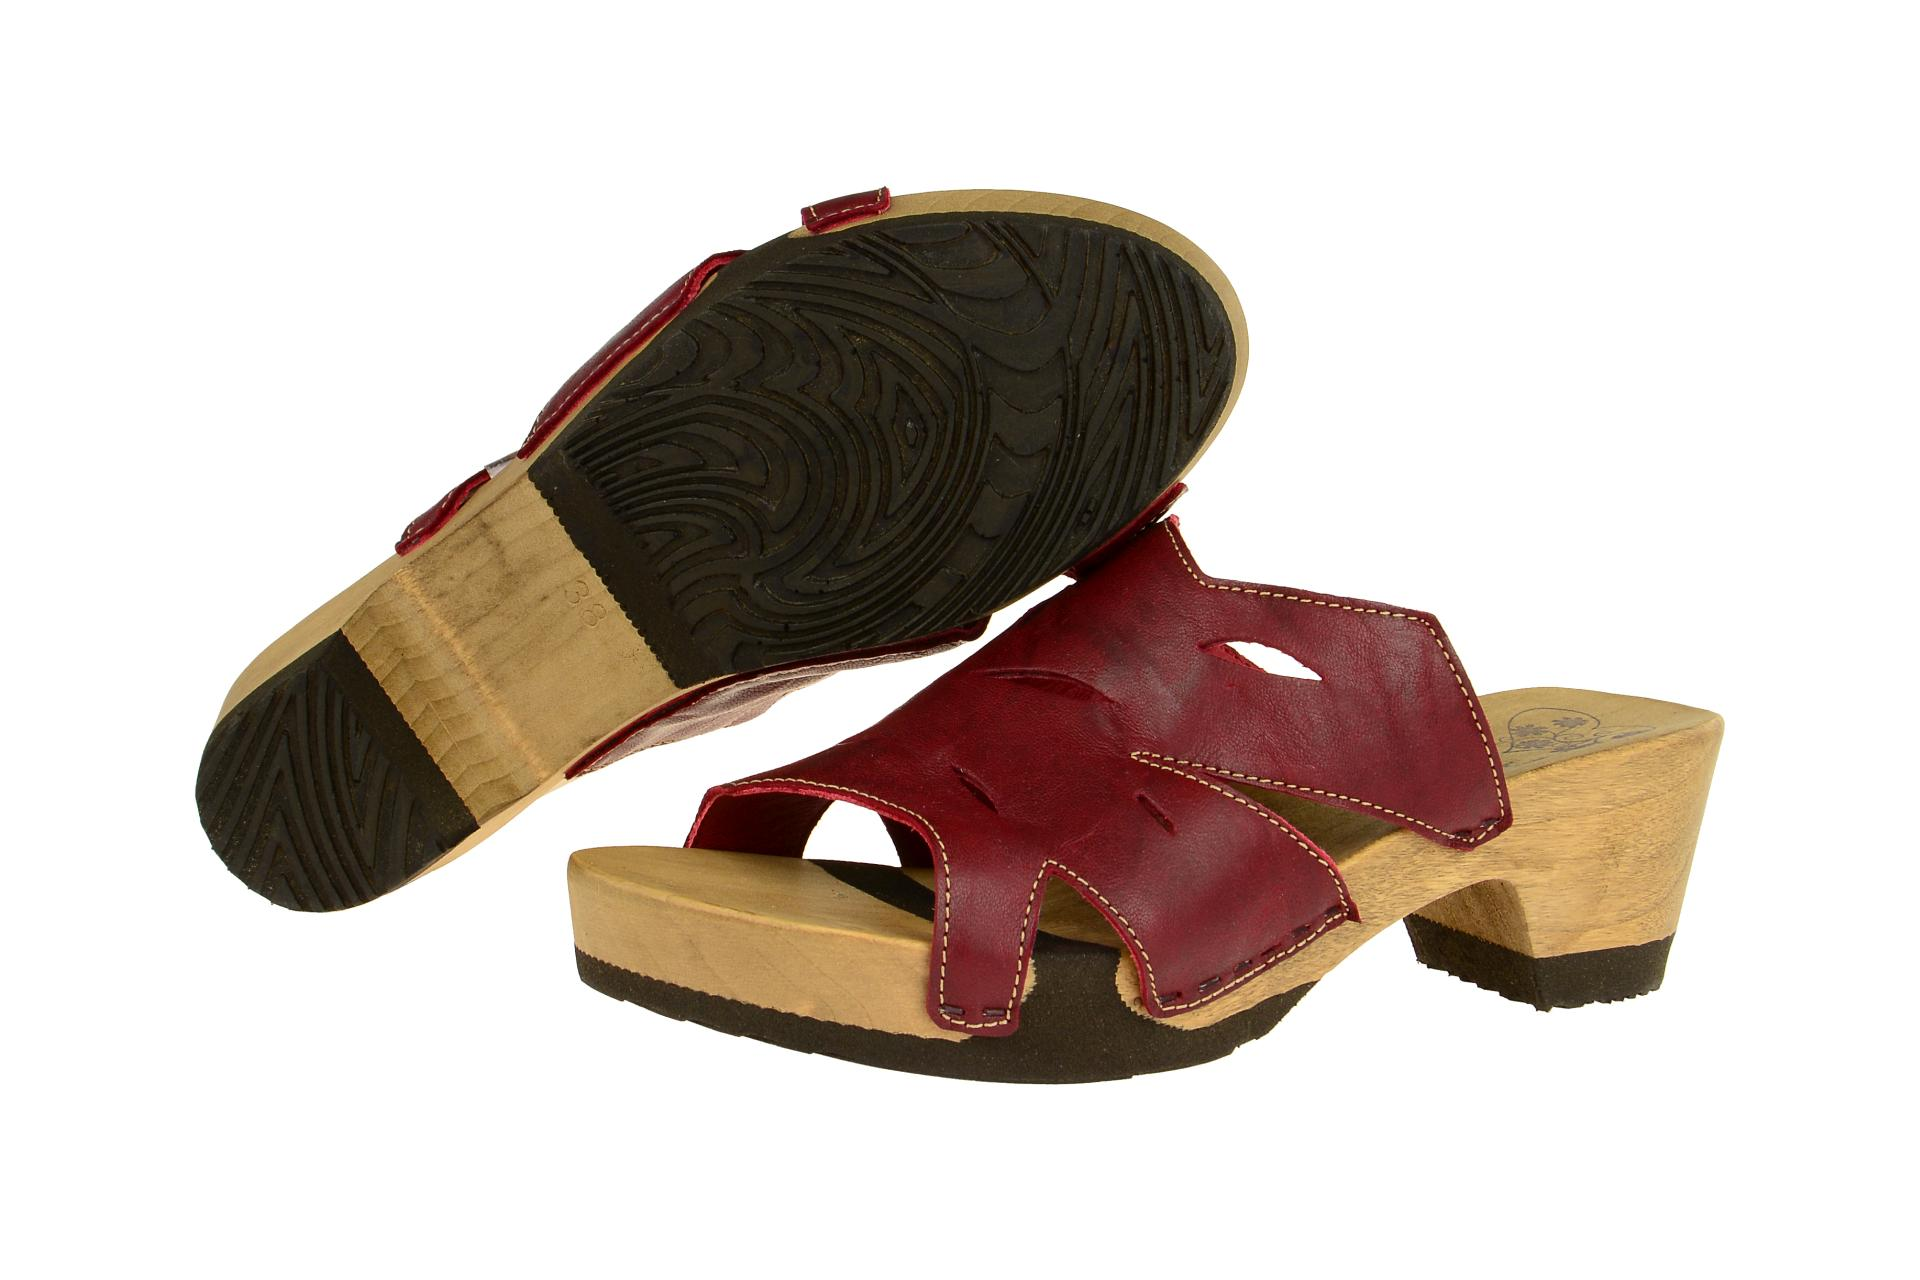 think schuhe zunda rot damen pantoletten pantolette 0 80736 72 neu ebay. Black Bedroom Furniture Sets. Home Design Ideas